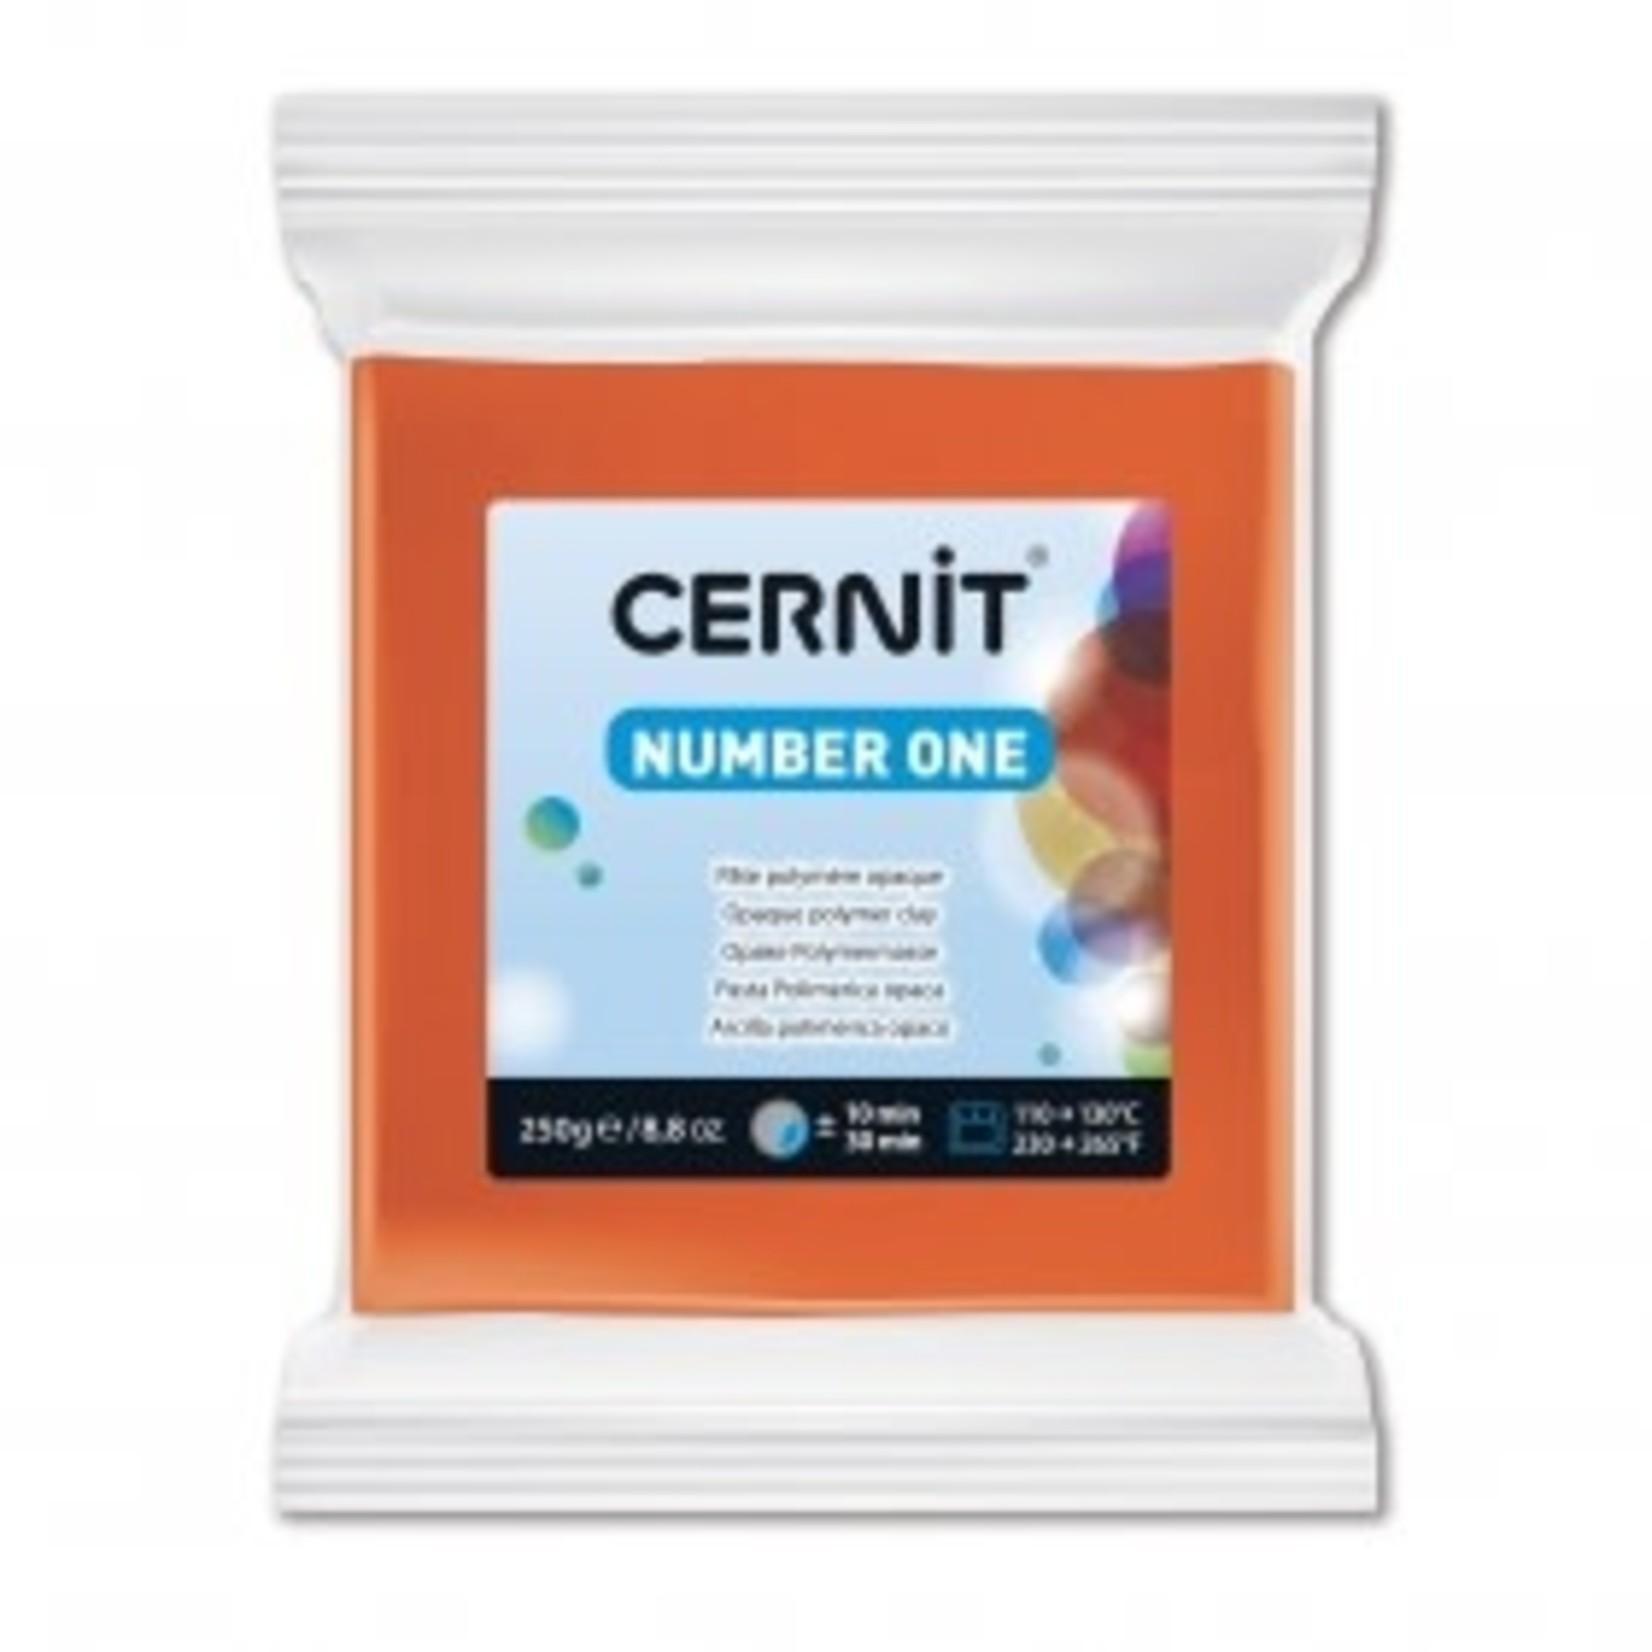 Cernit Cernit #1 250 G Orange